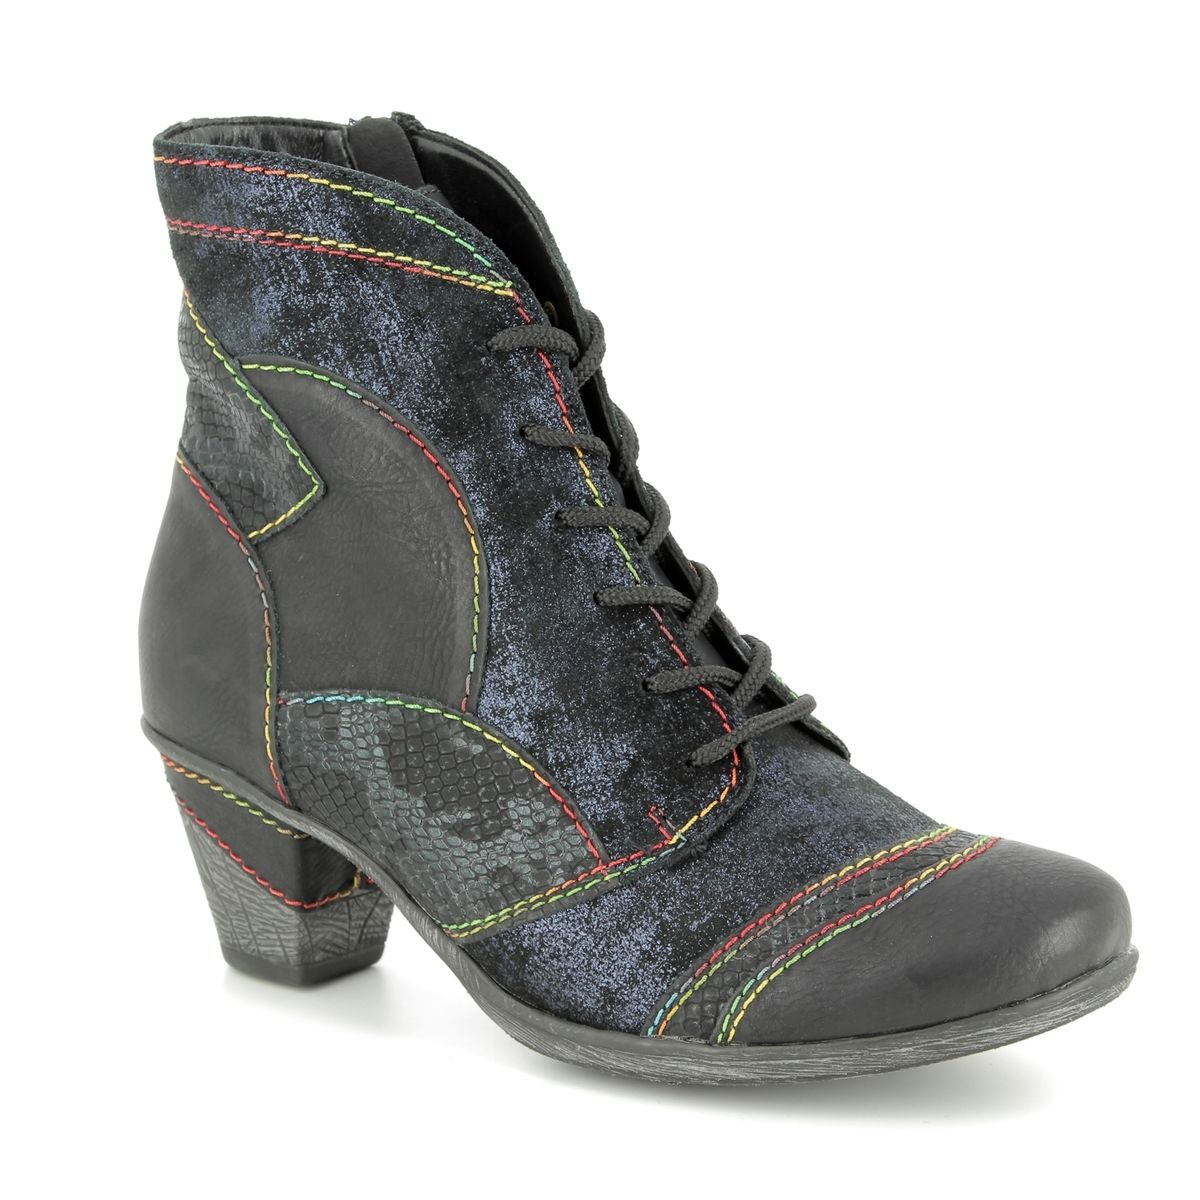 2260ca462ab9 Remonte Ankle Boots - Black - D8774-02 ANNITELA